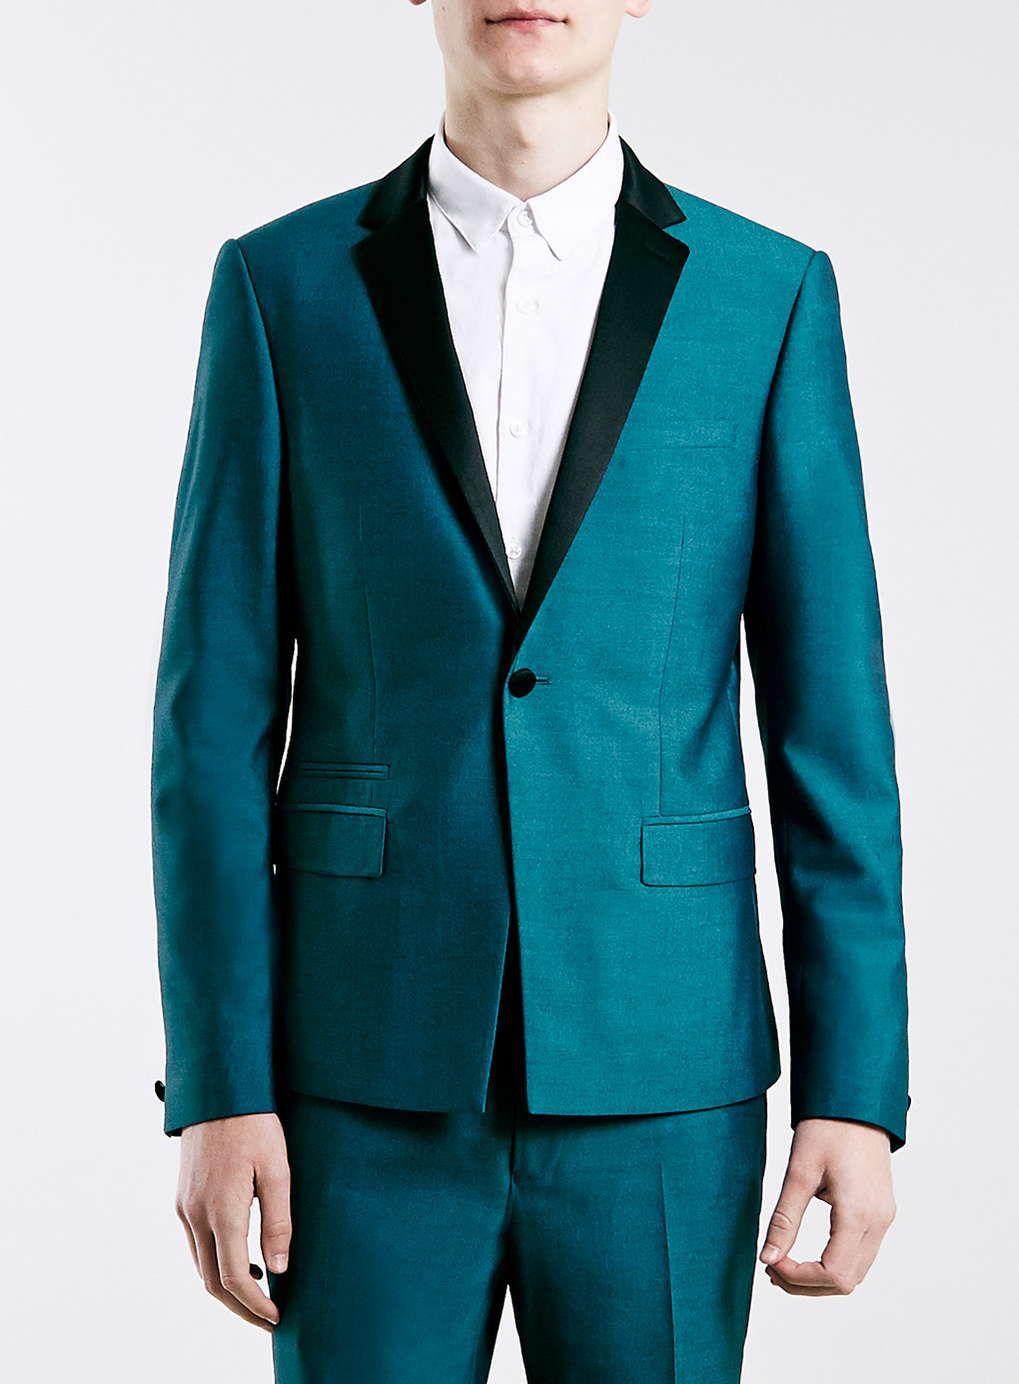 Enger Smoking, blaugrün - Eng geschnittene Anzüge - Anzüge - TOPMAN DEUTSCHLAND